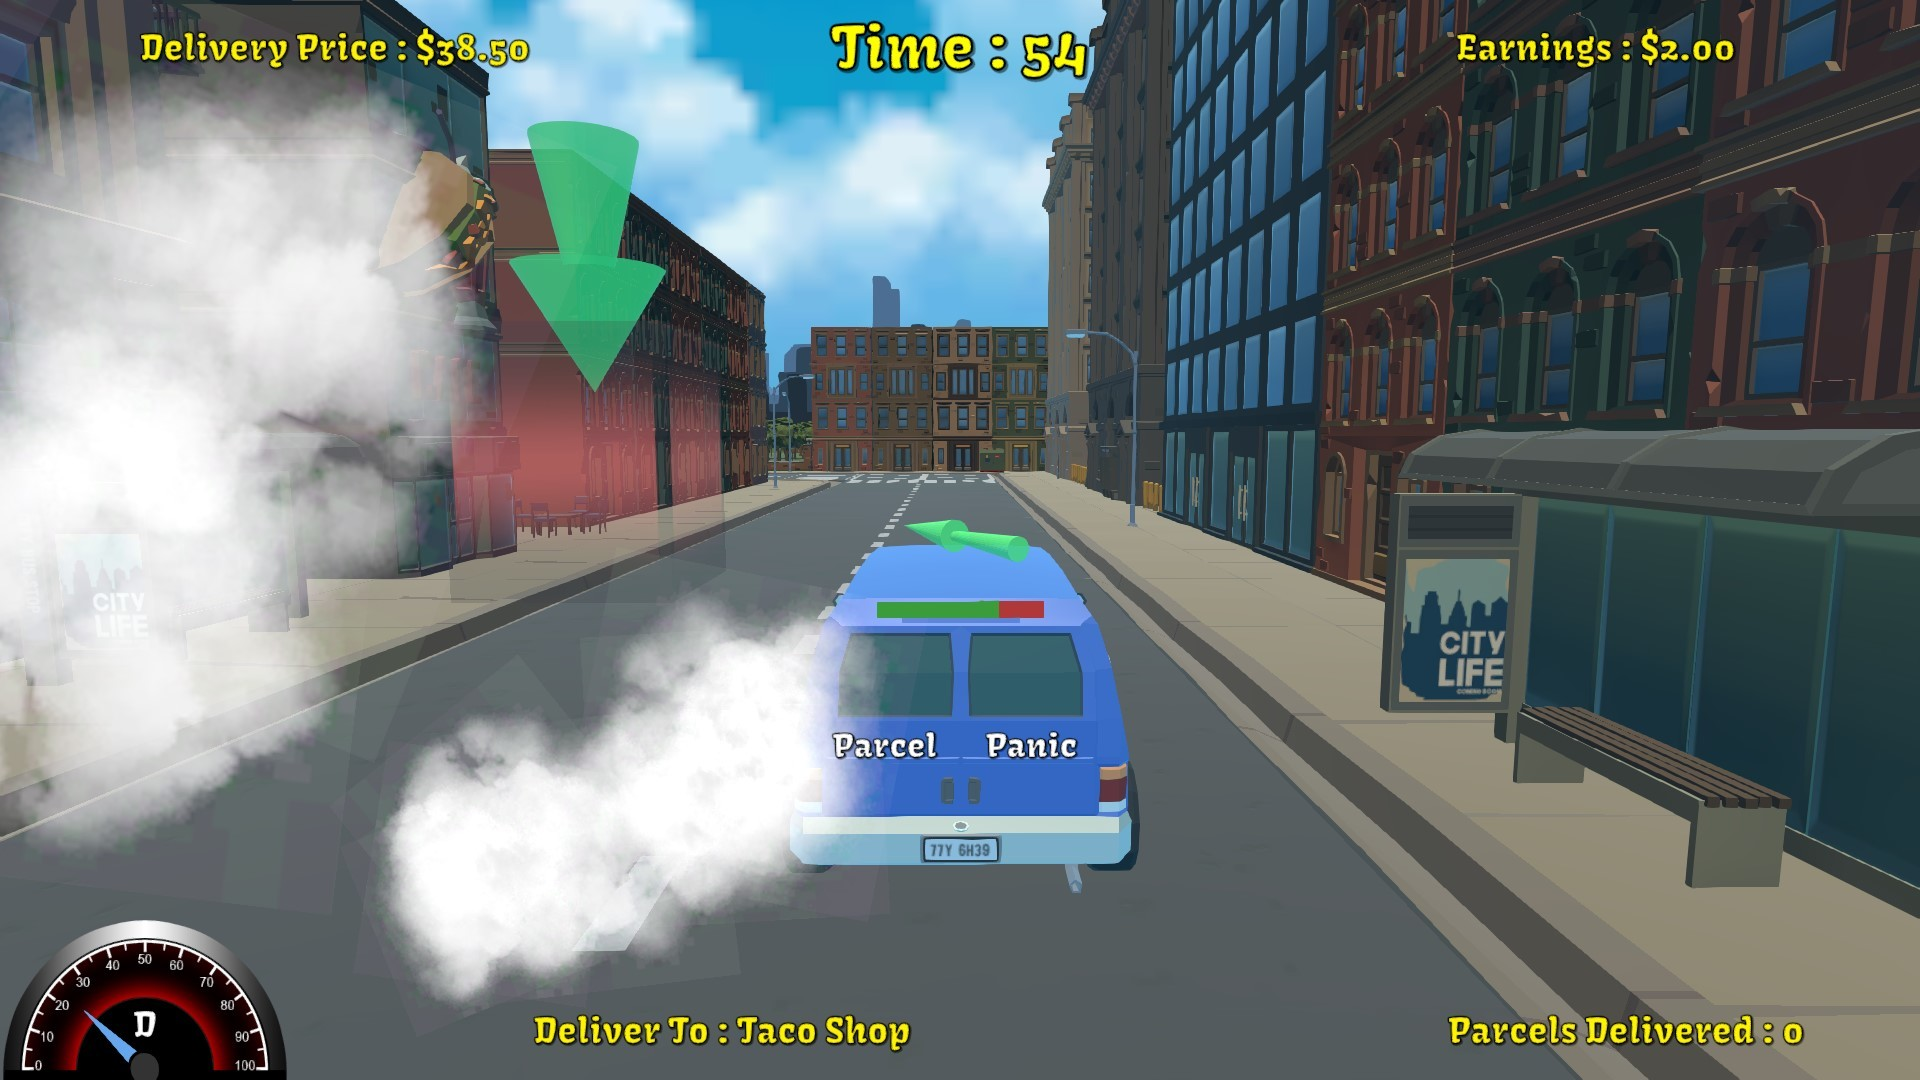 Parcel Panic screenshot